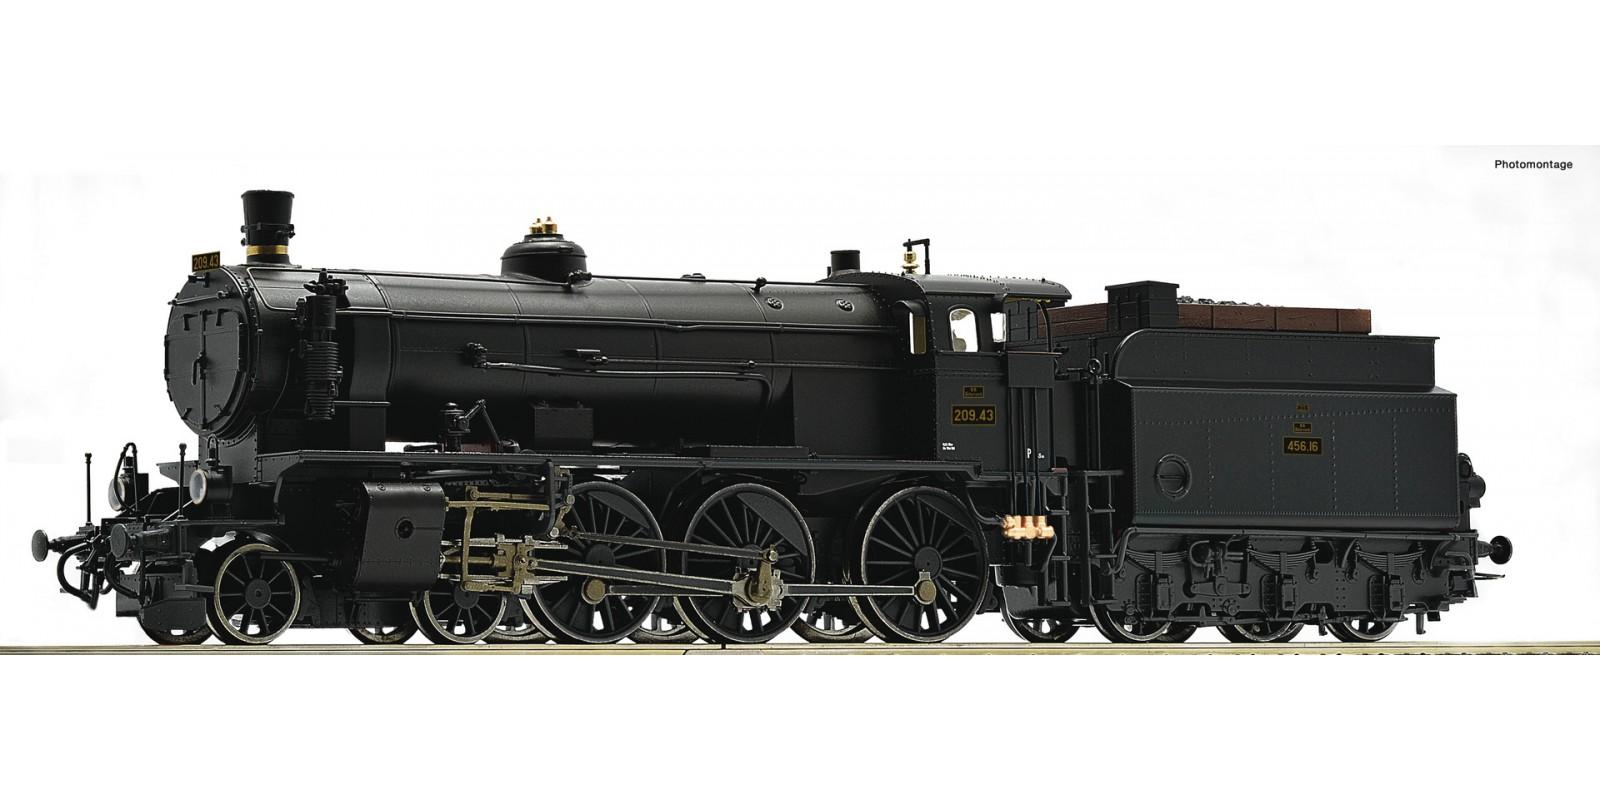 RO72109 Steam locomotive 209.43